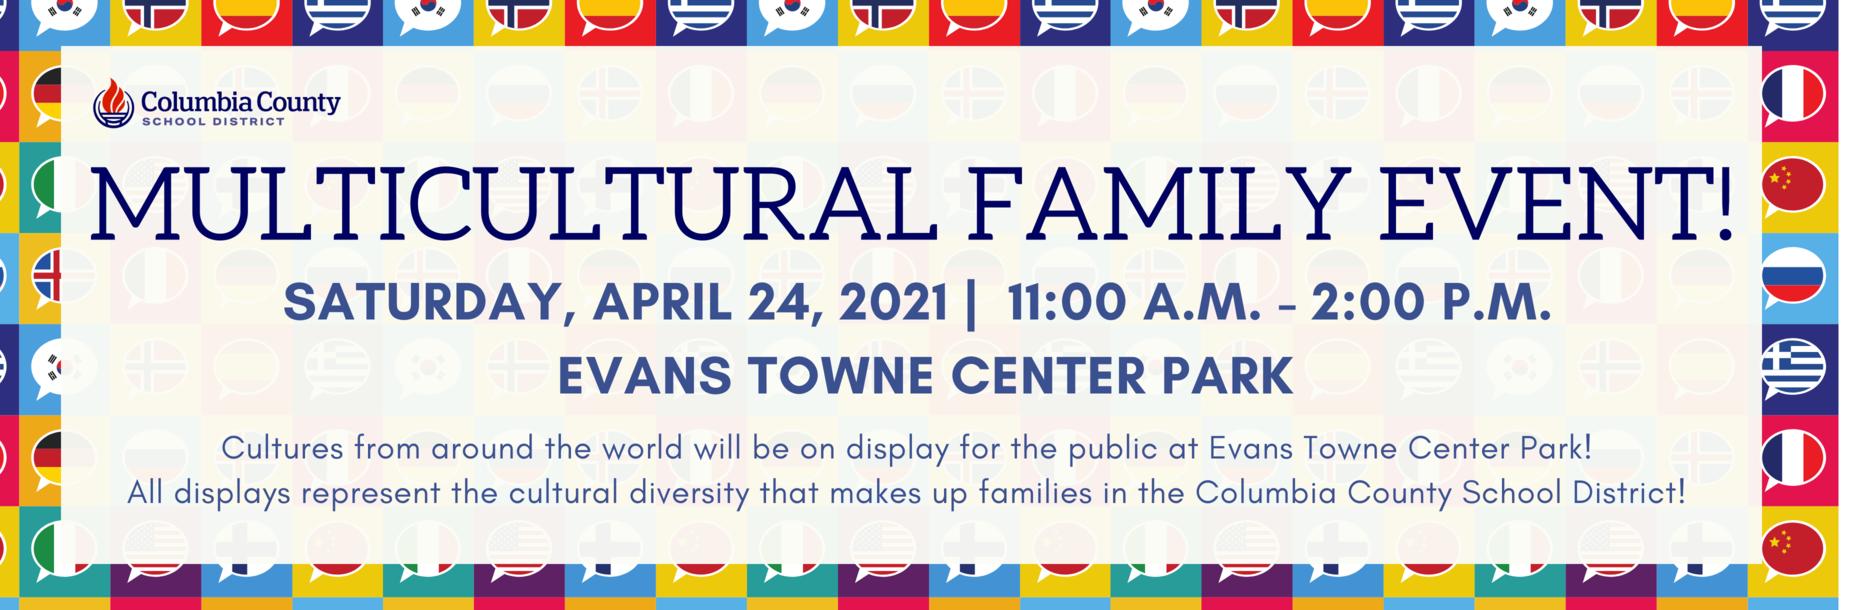 Multicultural Family Event April 24, 2021 11:00 a.m. - 2:00 p.m.